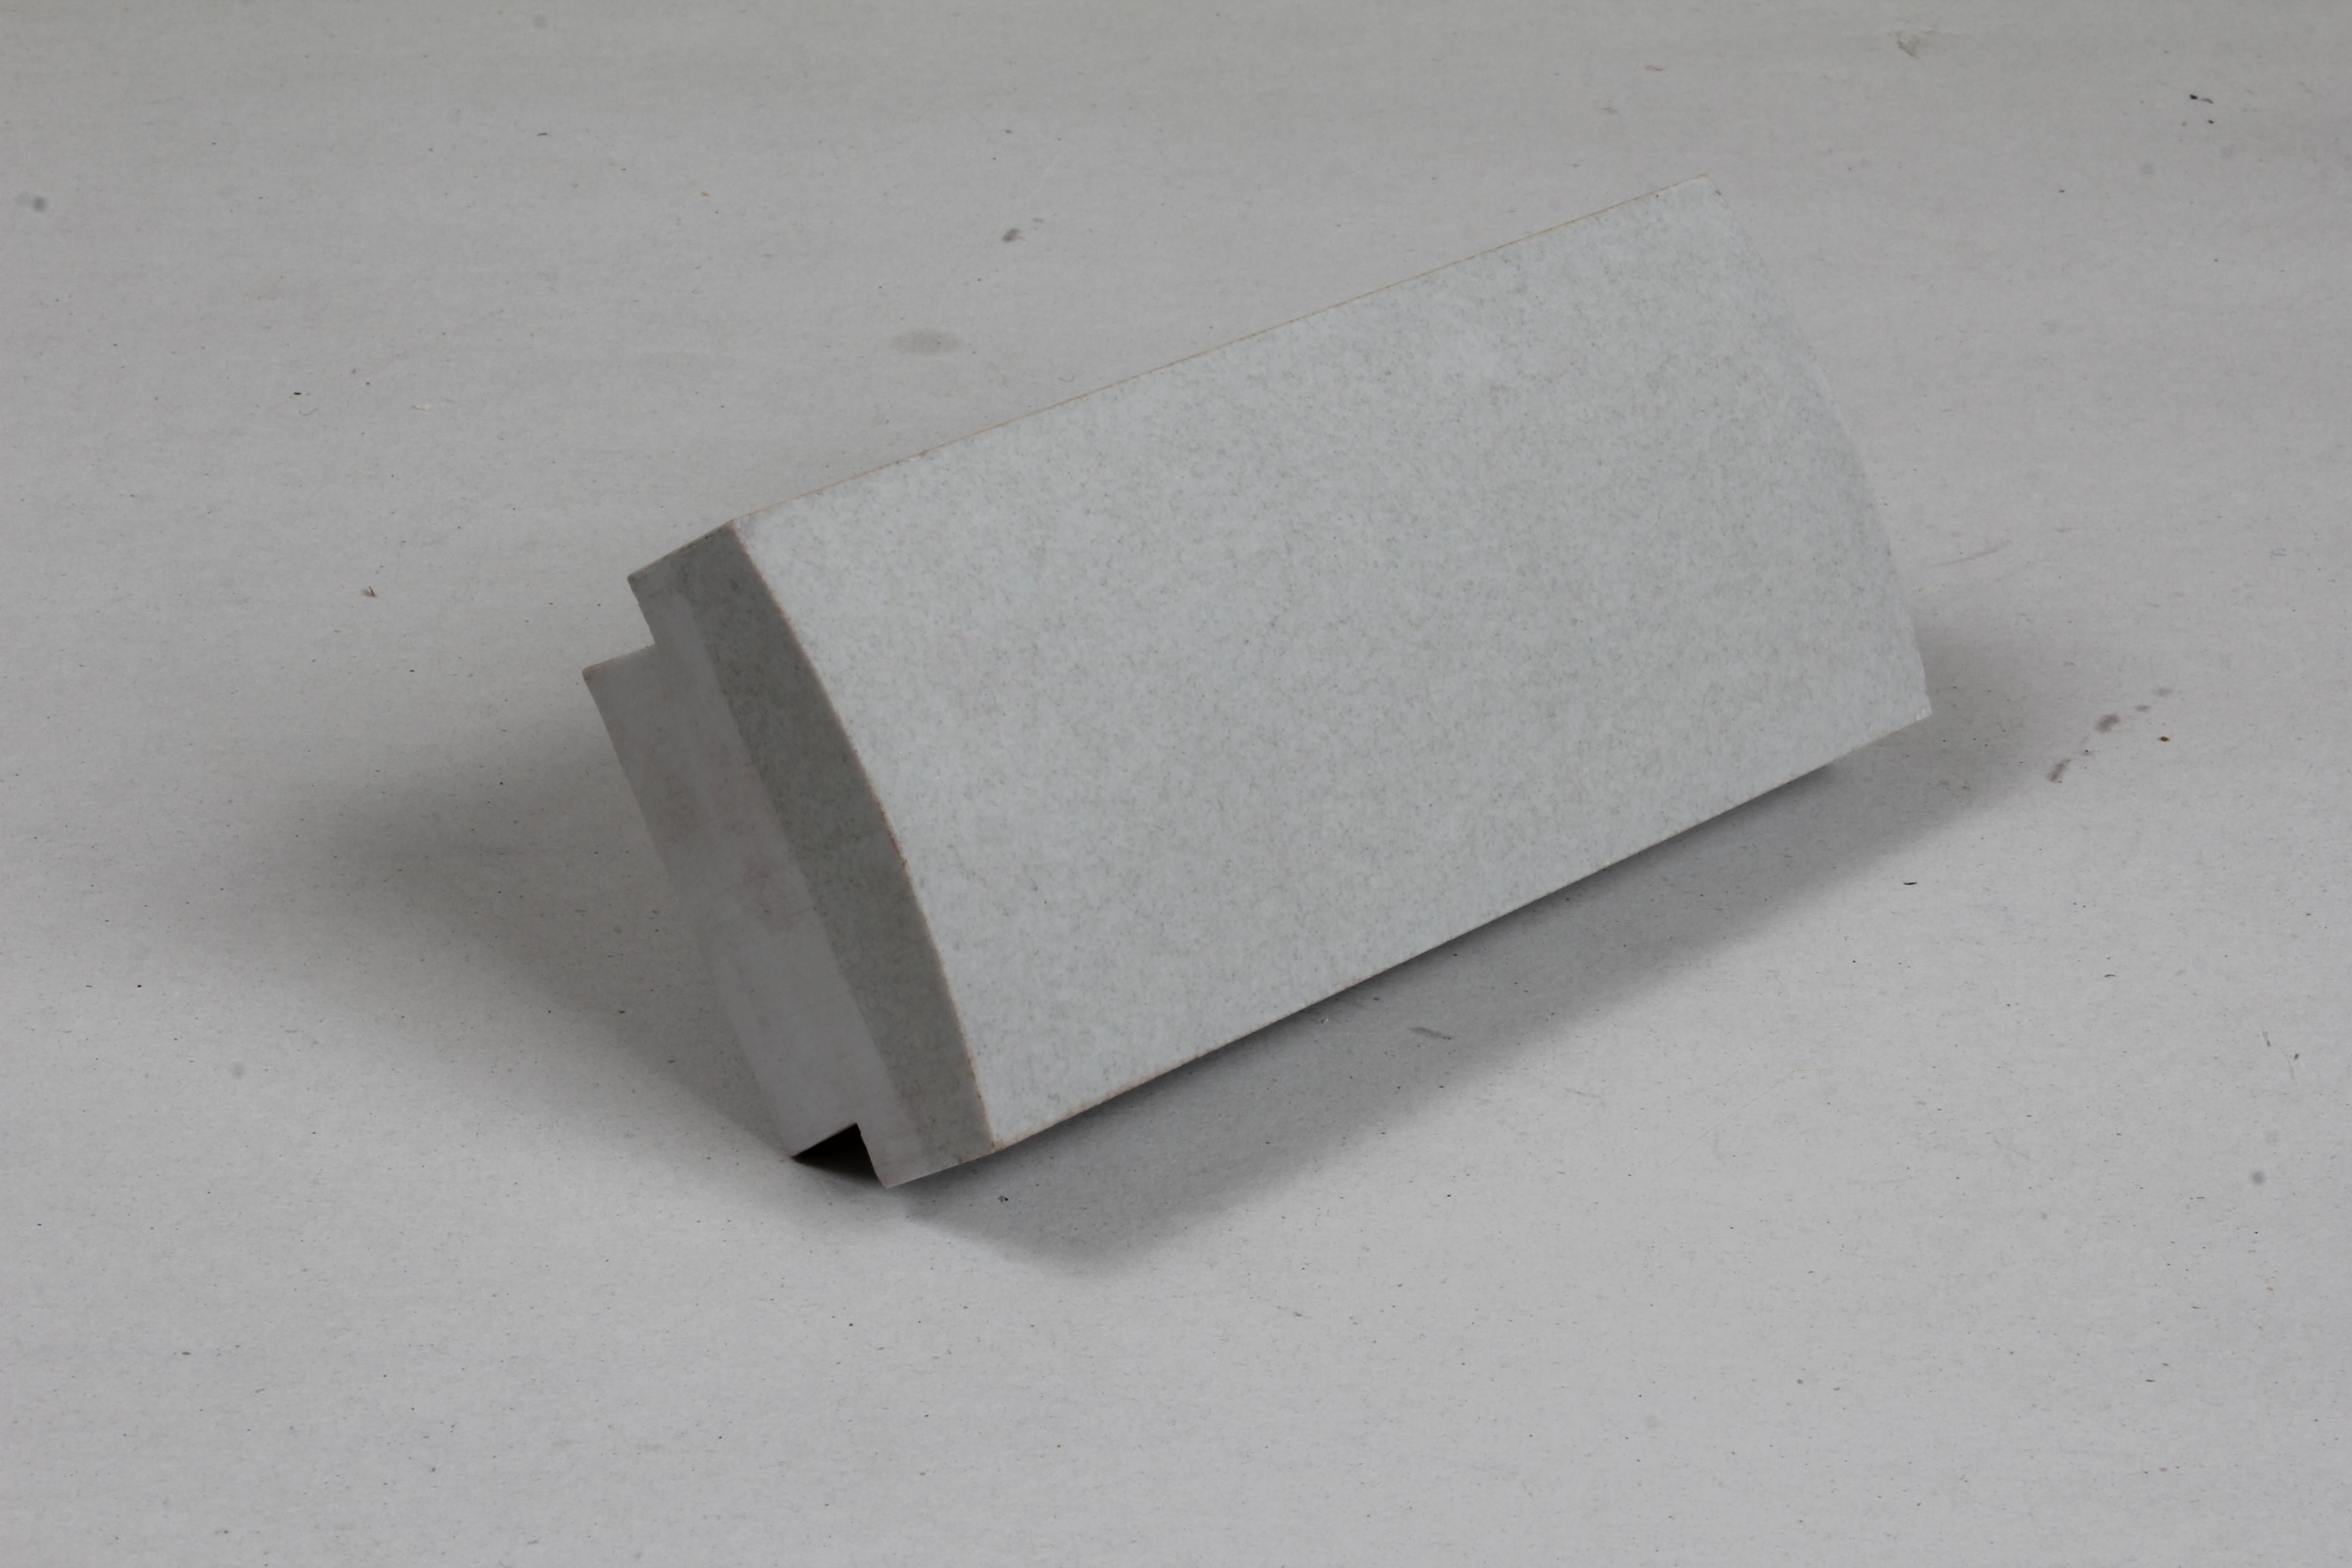 FICKERT RESIN BOND DIAMOND SINGLE CASTING 140